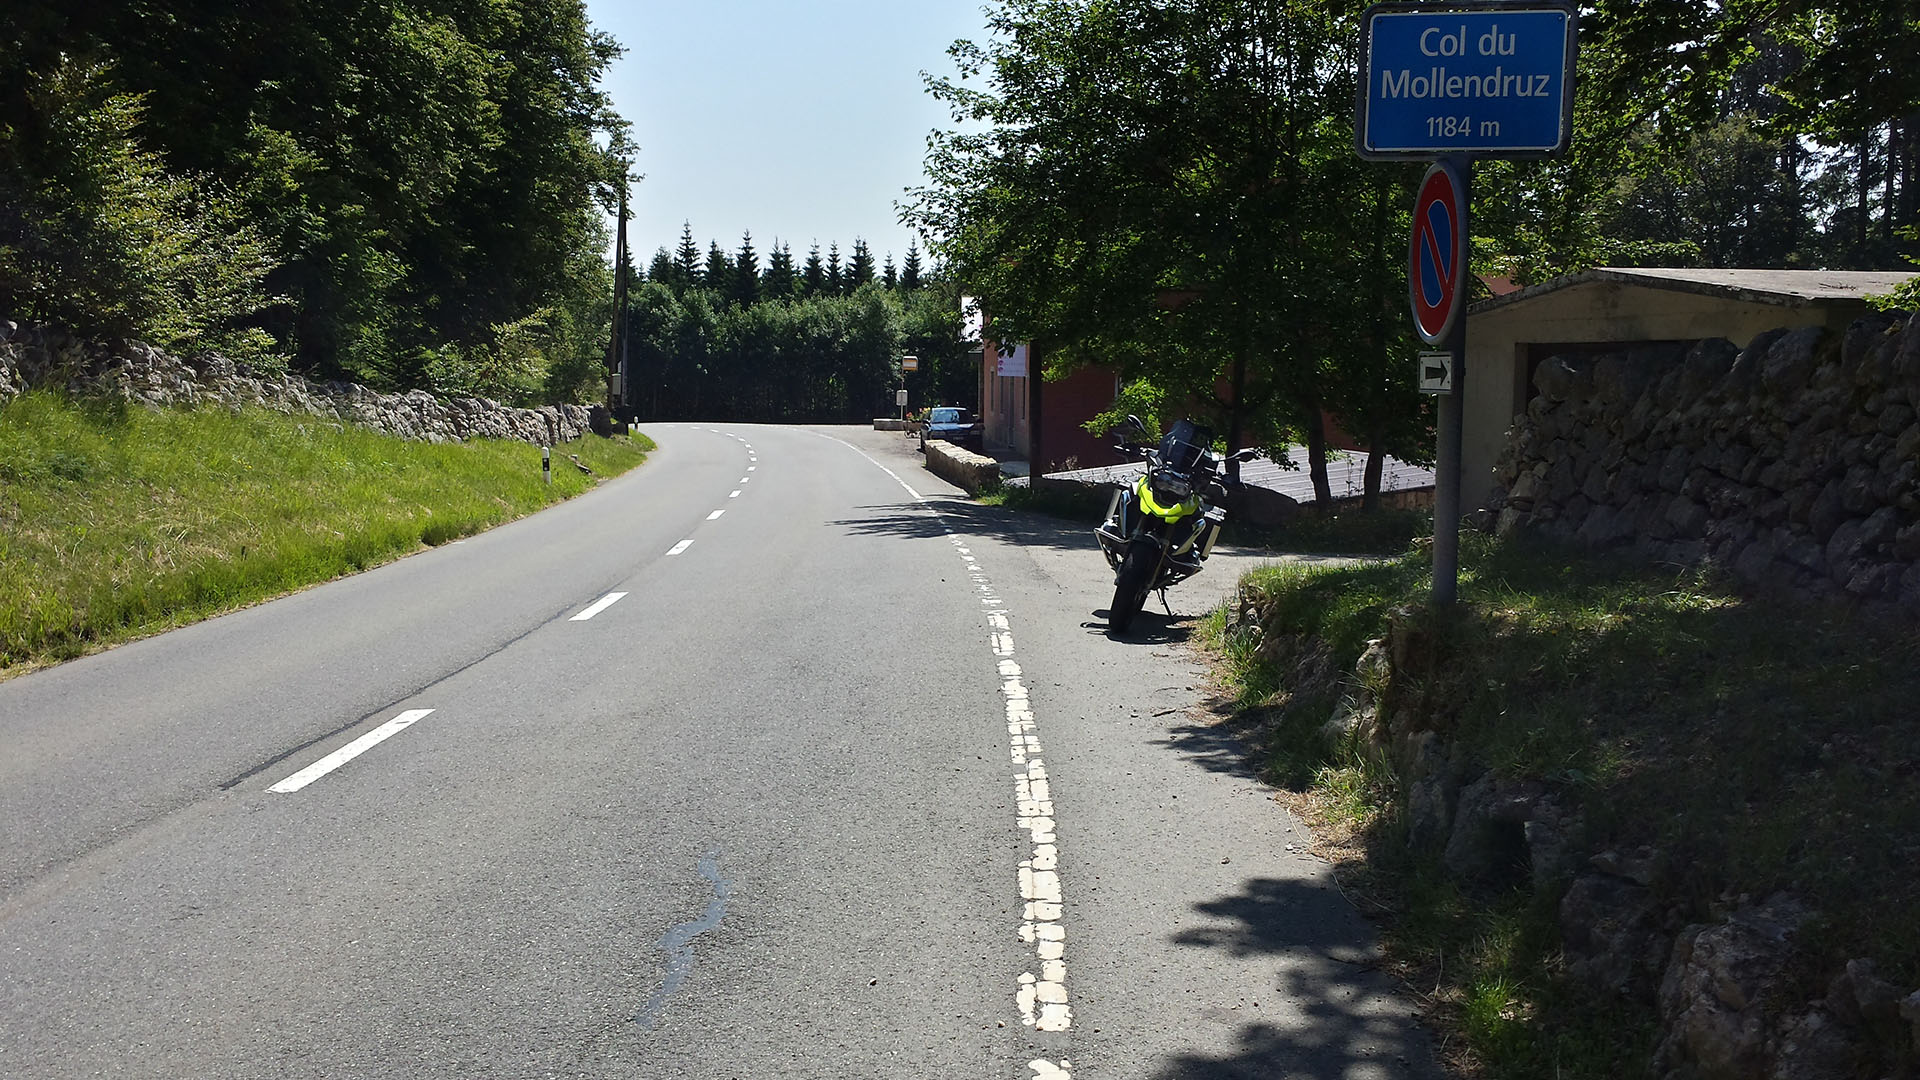 1184 - CH - Col du Mollendruz